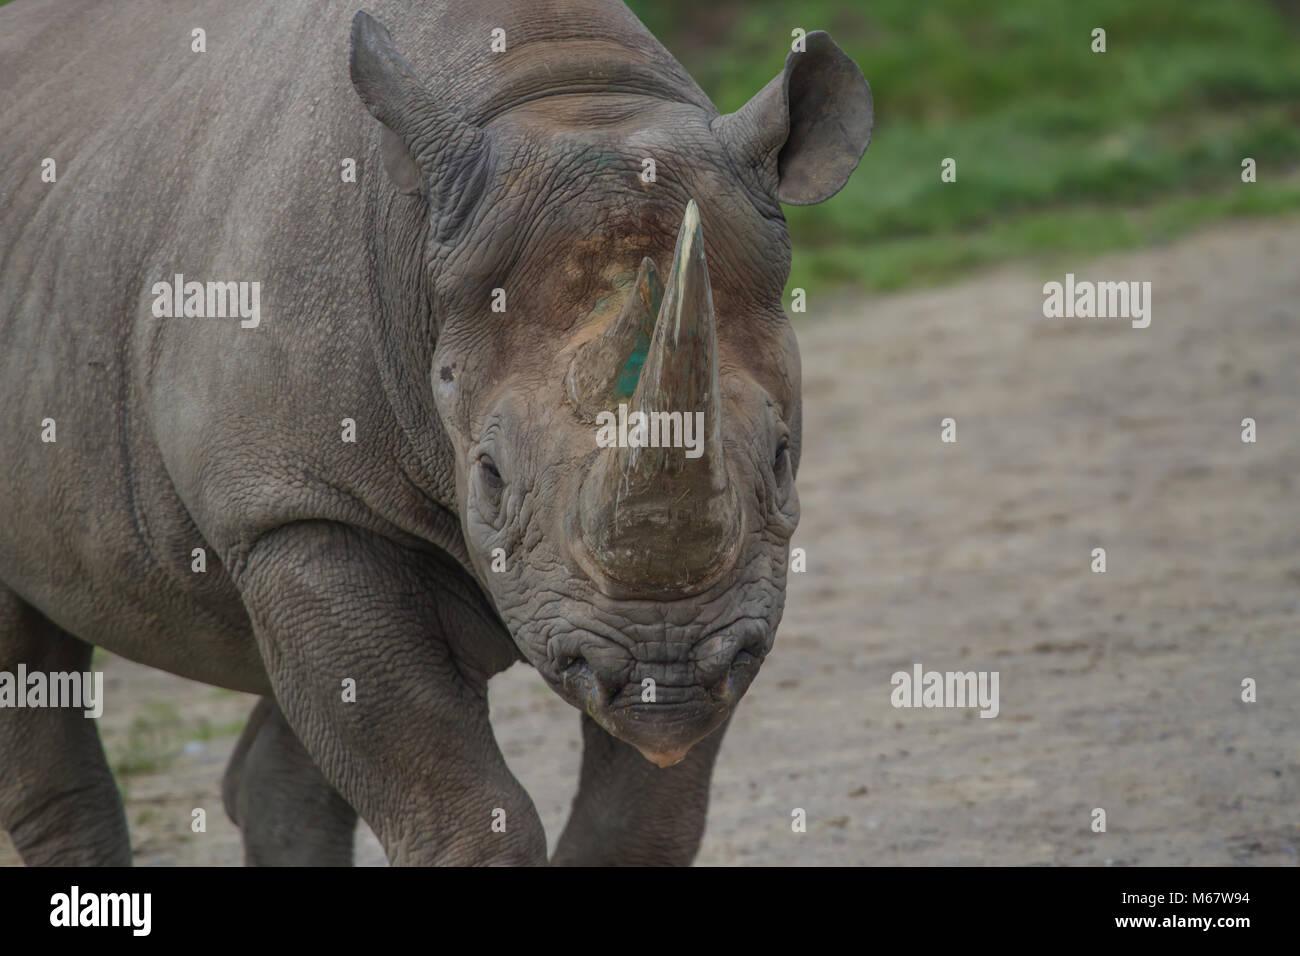 photo of a beautiful majestic Black Rhino - Stock Image